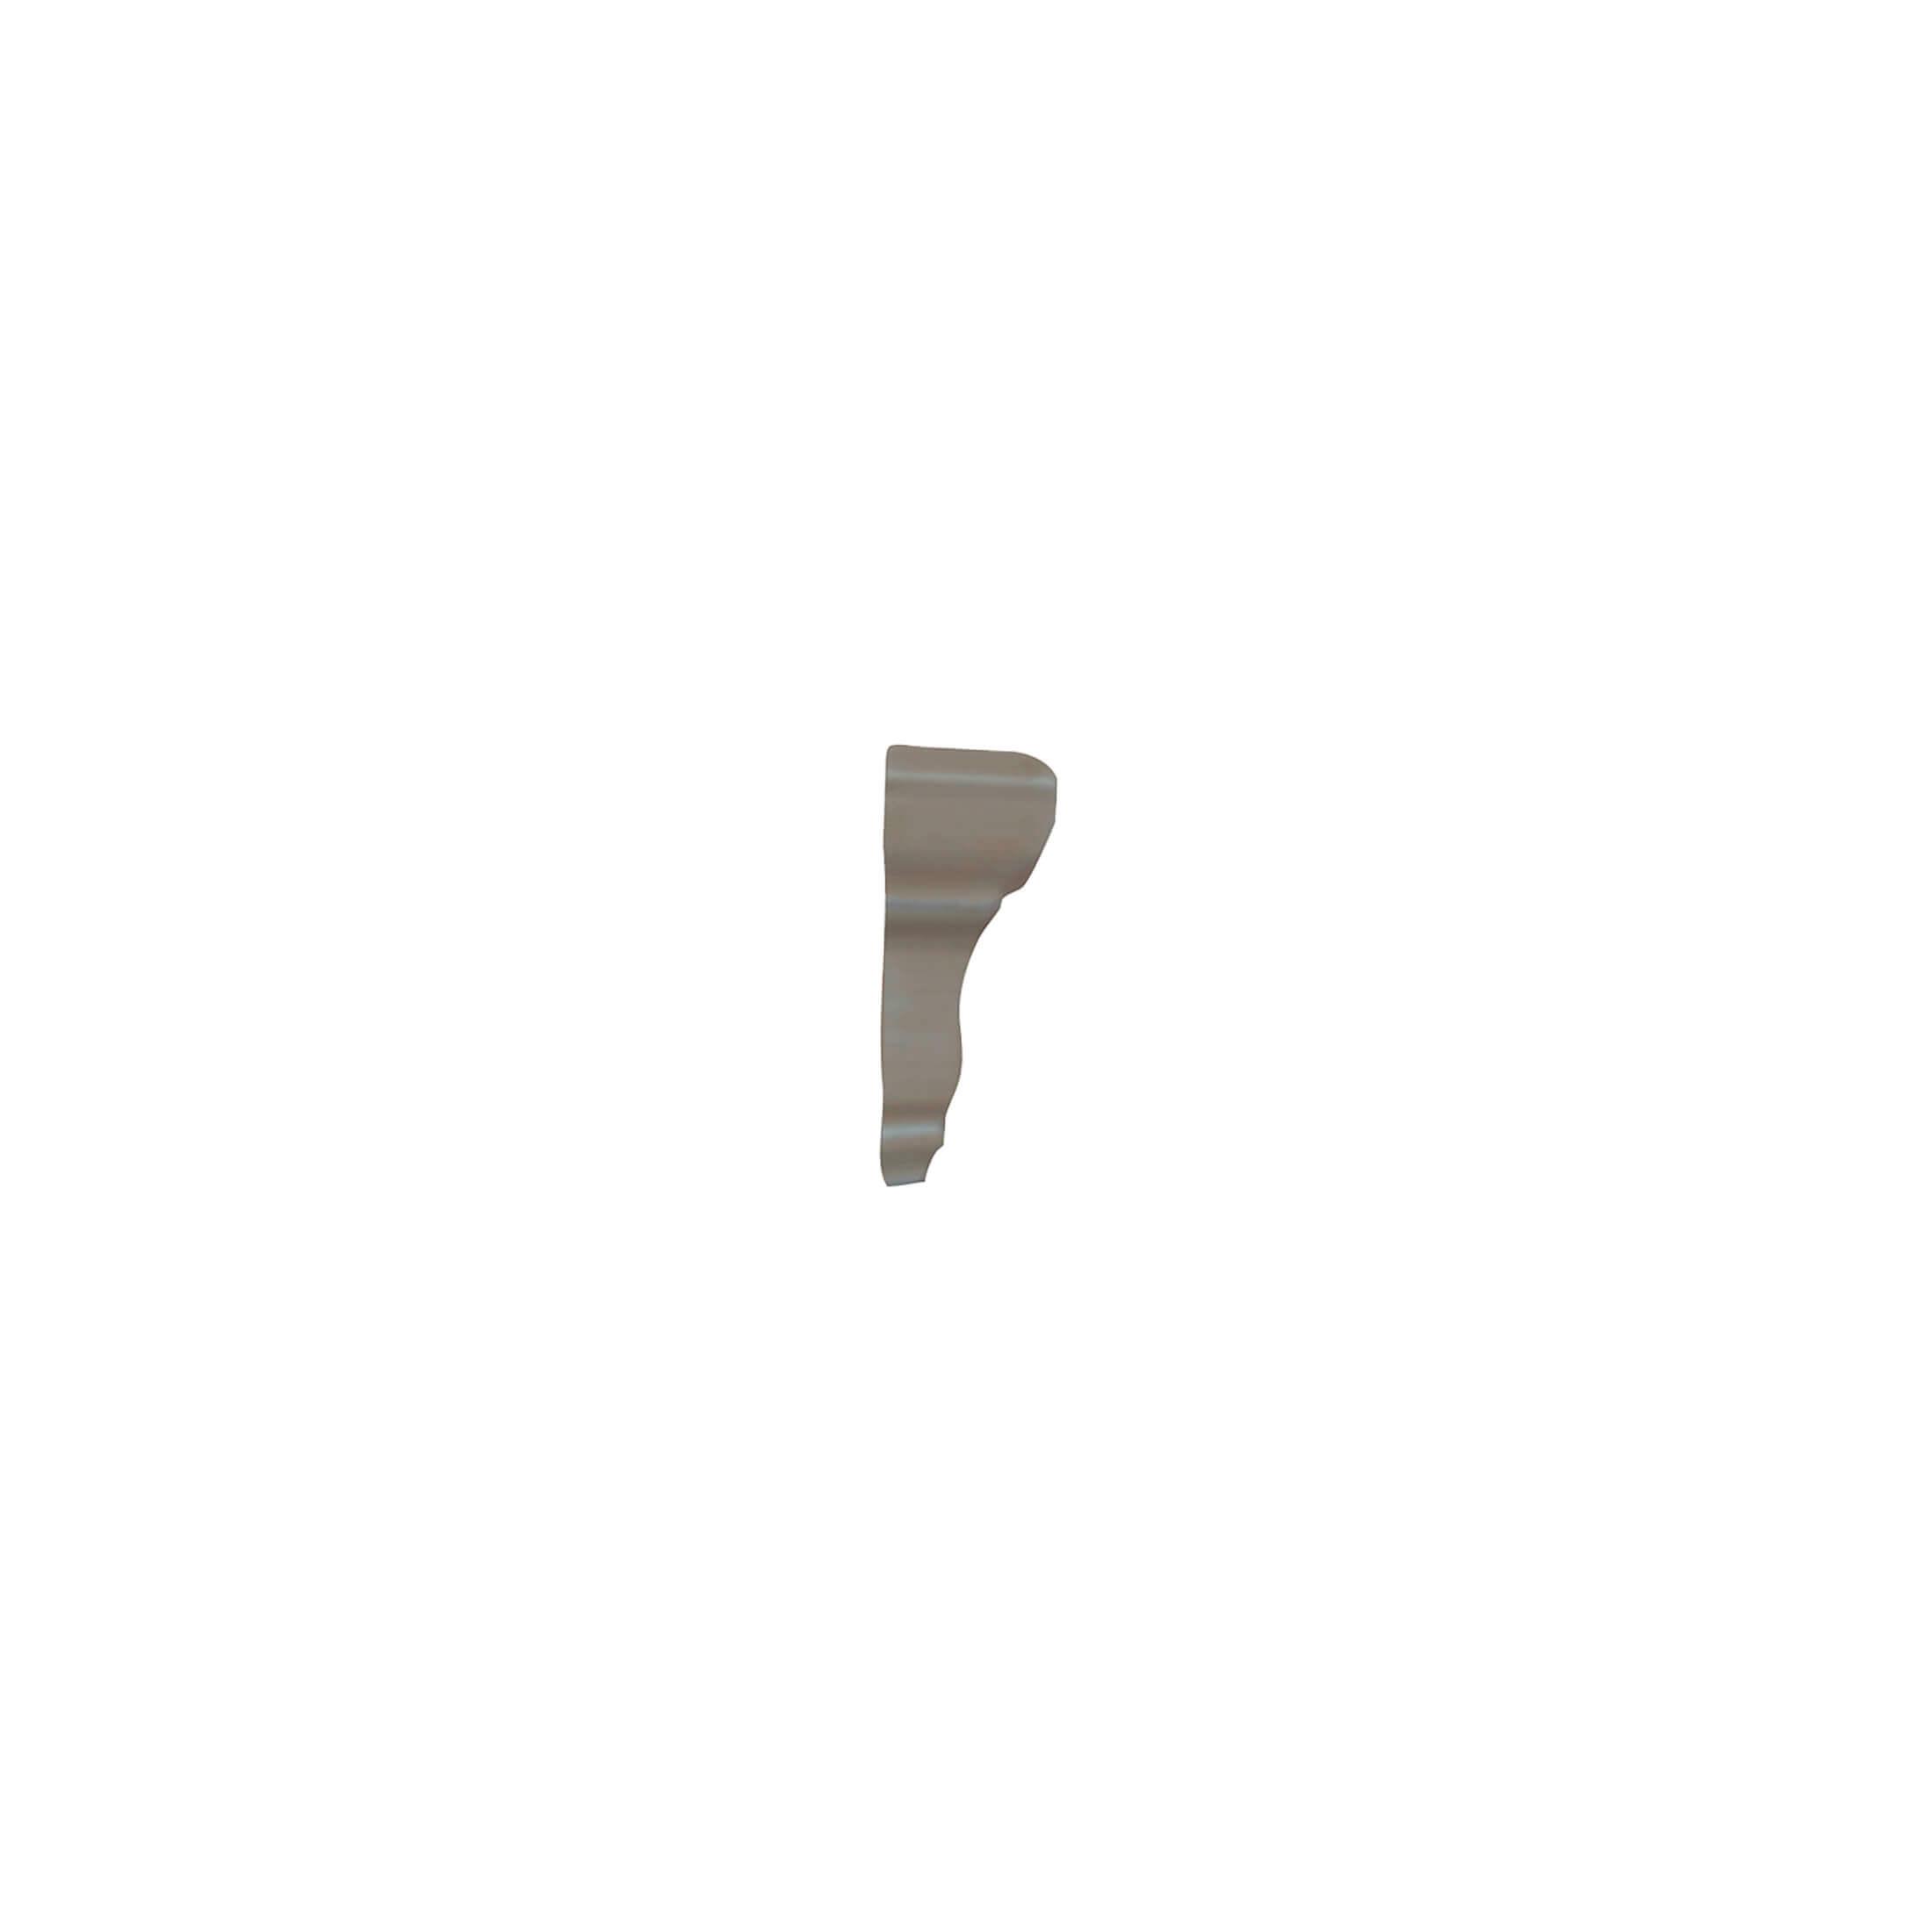 ADST5116 - ANGULO EXTERIOR CORNISA - 7.5 cm X 19.8 cm